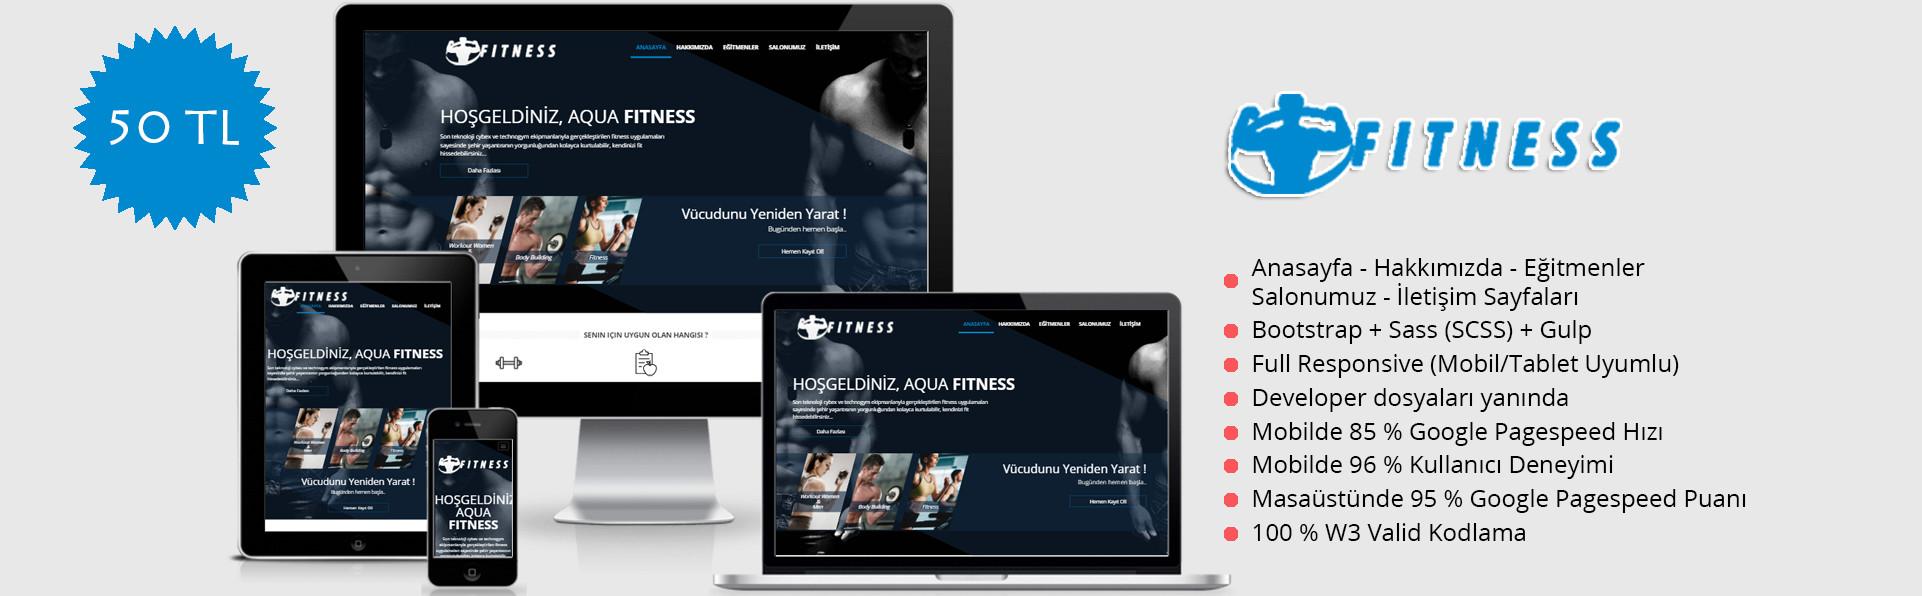 Fitness & Spor Salonu Satış 1